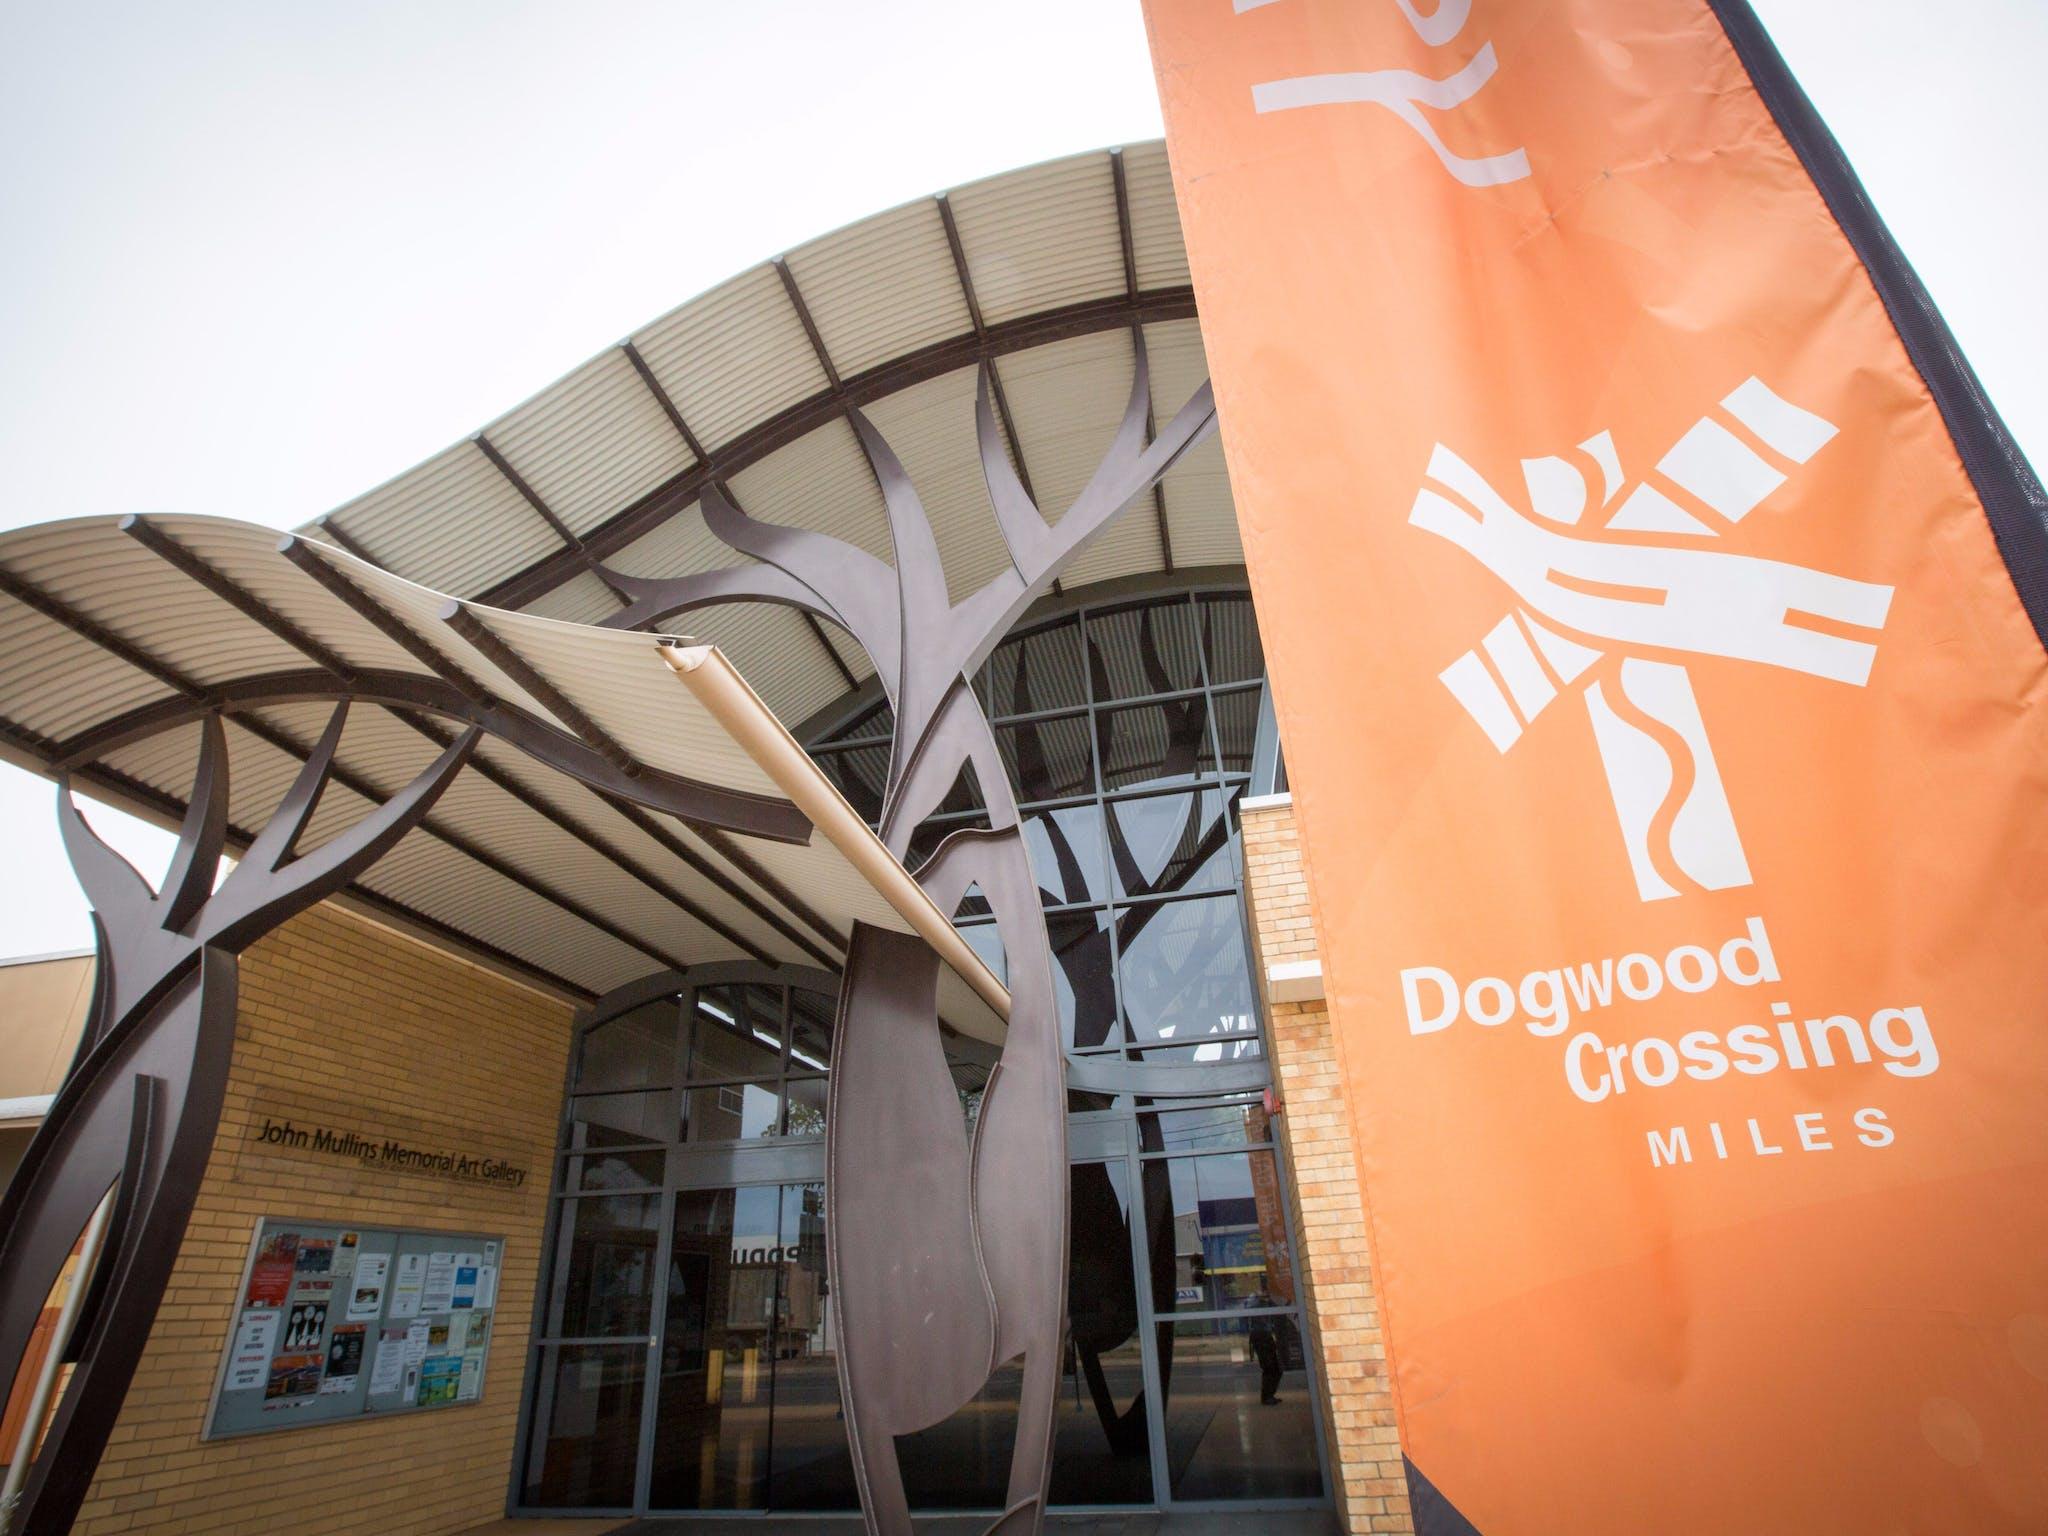 Dogwood Crossing, Miles